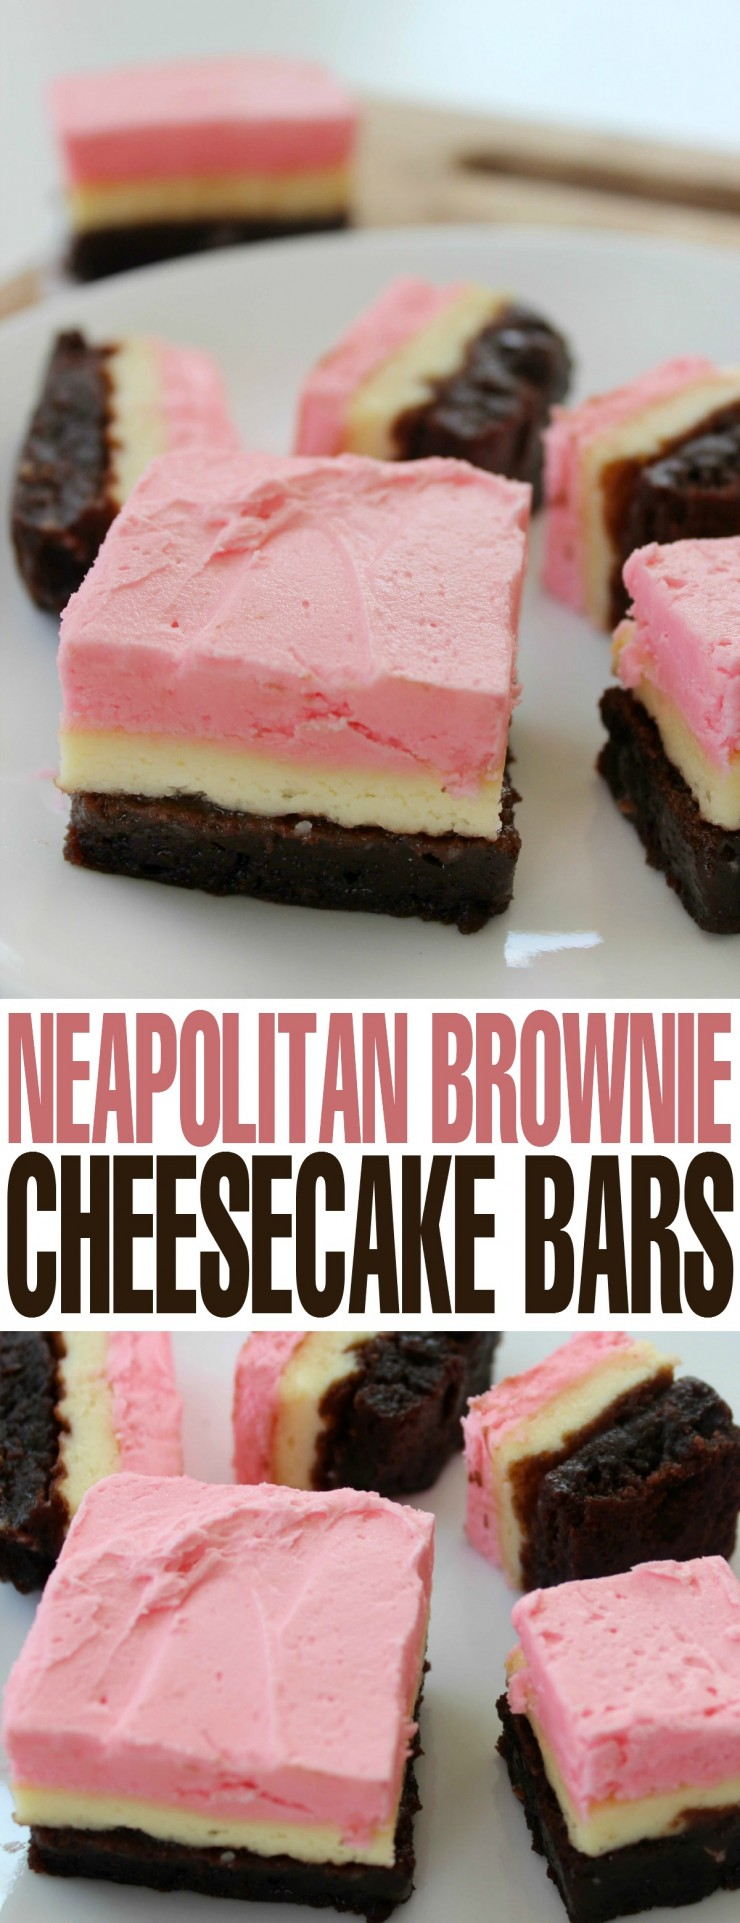 These Neapolitan Brownie Cheesecake Bars are a pretty and delicious dessert recipe!